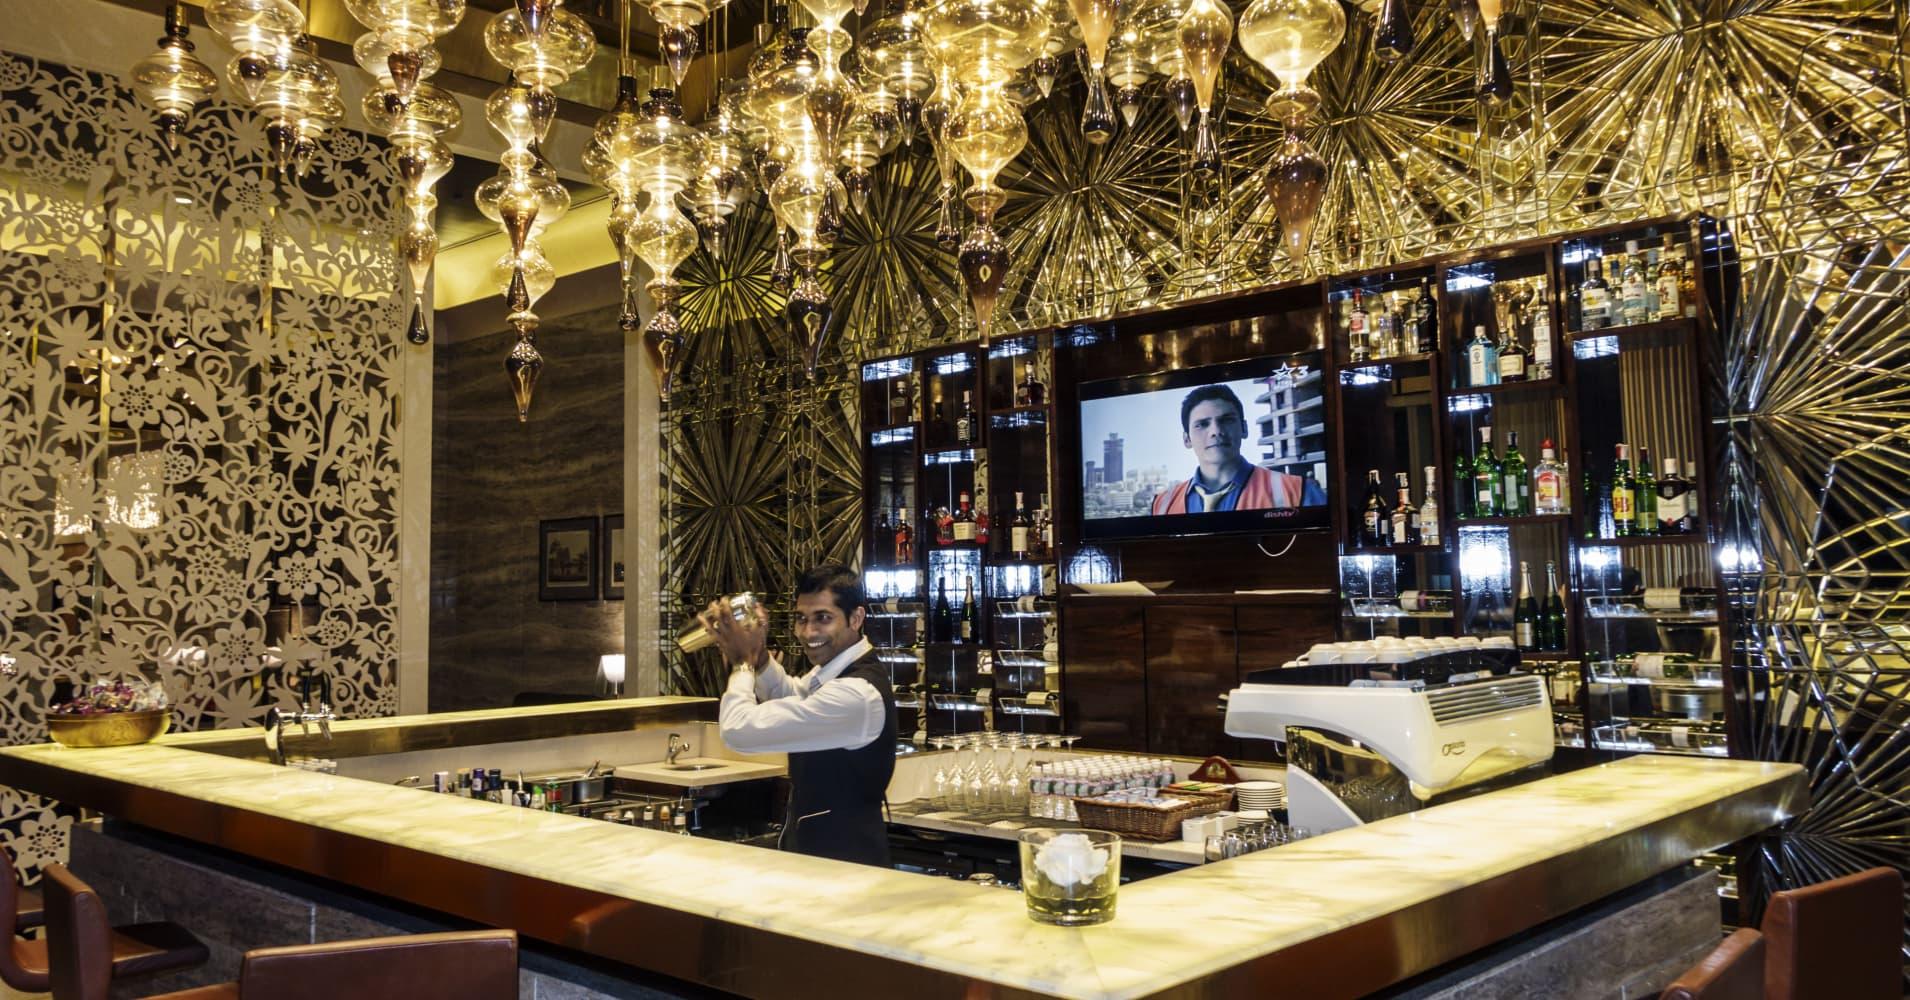 The Etihad GVK First Business Lounge at the Indian Mumbai Chhatrapati Shivaji International Airport